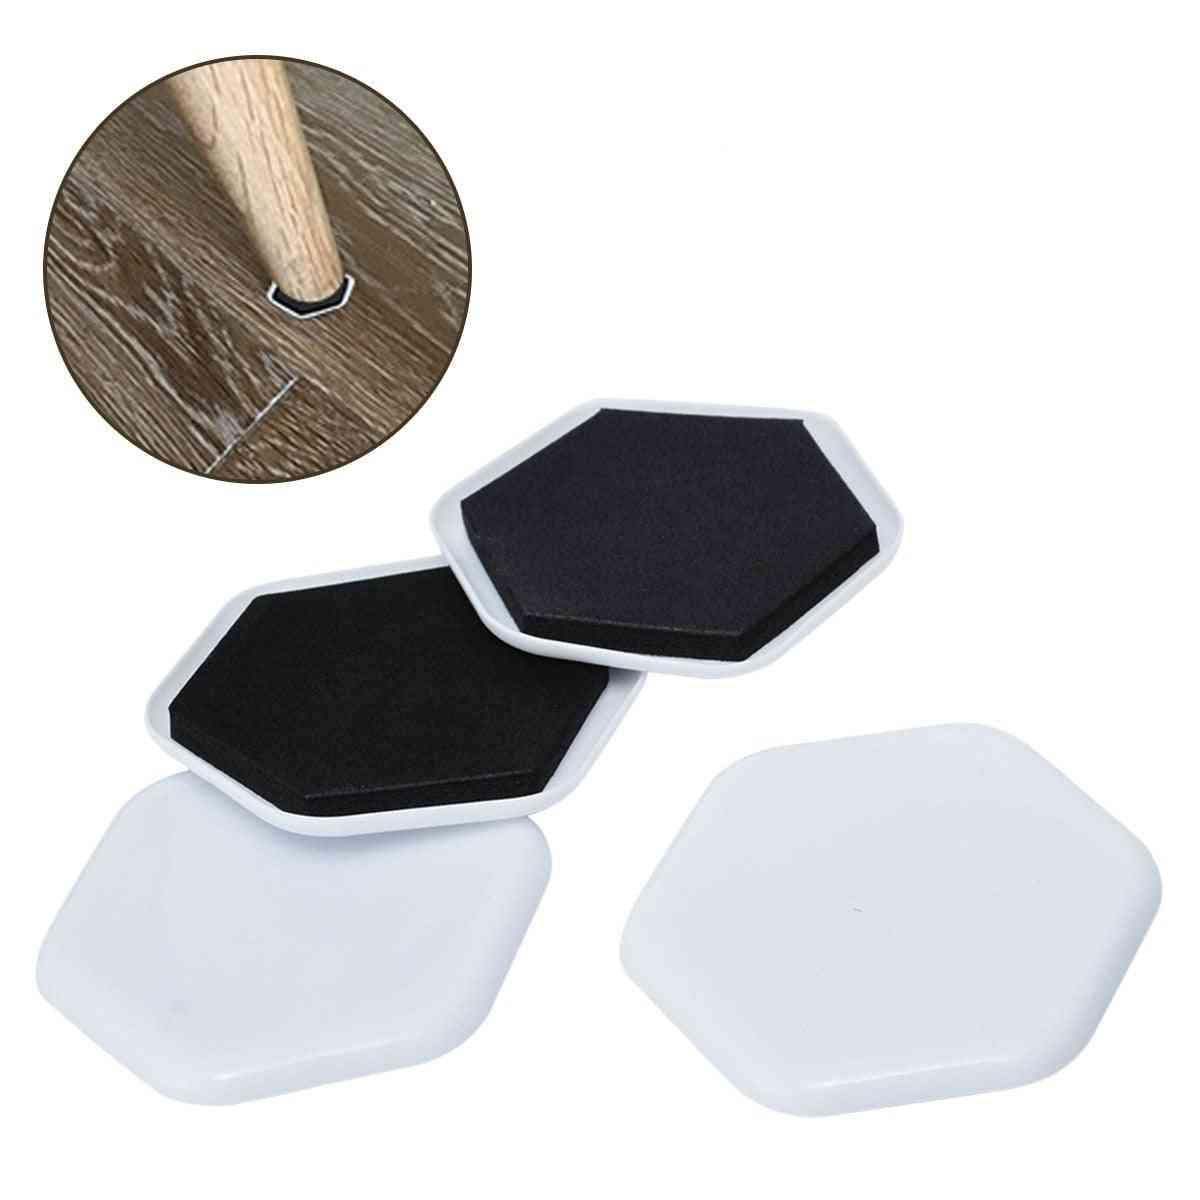 Furniture Moving Slider Pad, Floor Scratch Resistant Protector